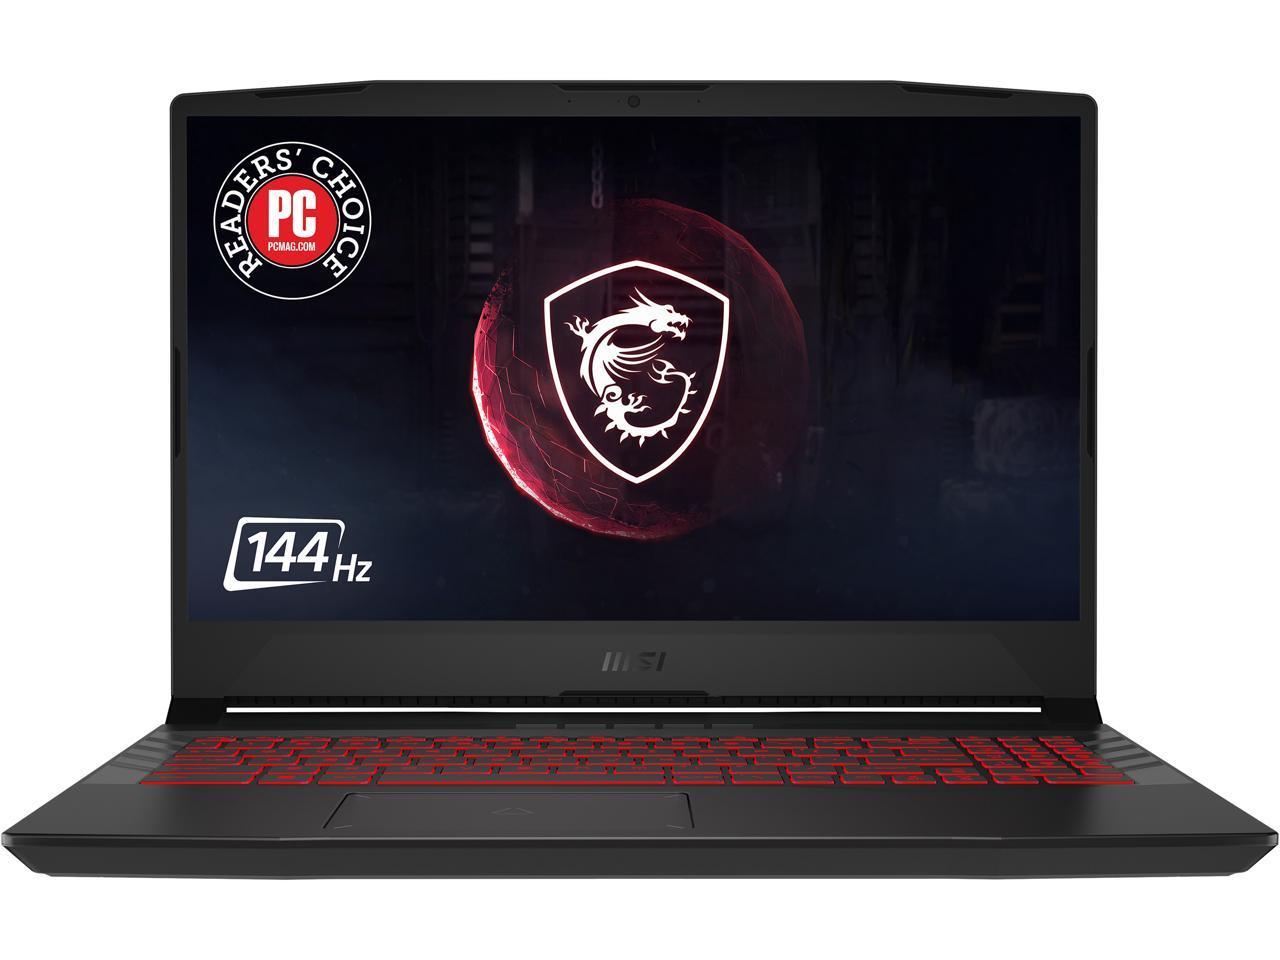 MSI (Pulse GL66 11UEK-034 ) 15.6″ 144 Hz Gaming Laptop, 11th Gen Core i7 8-Core, 16GB RAM, 1TB HDD + 512GB SSD